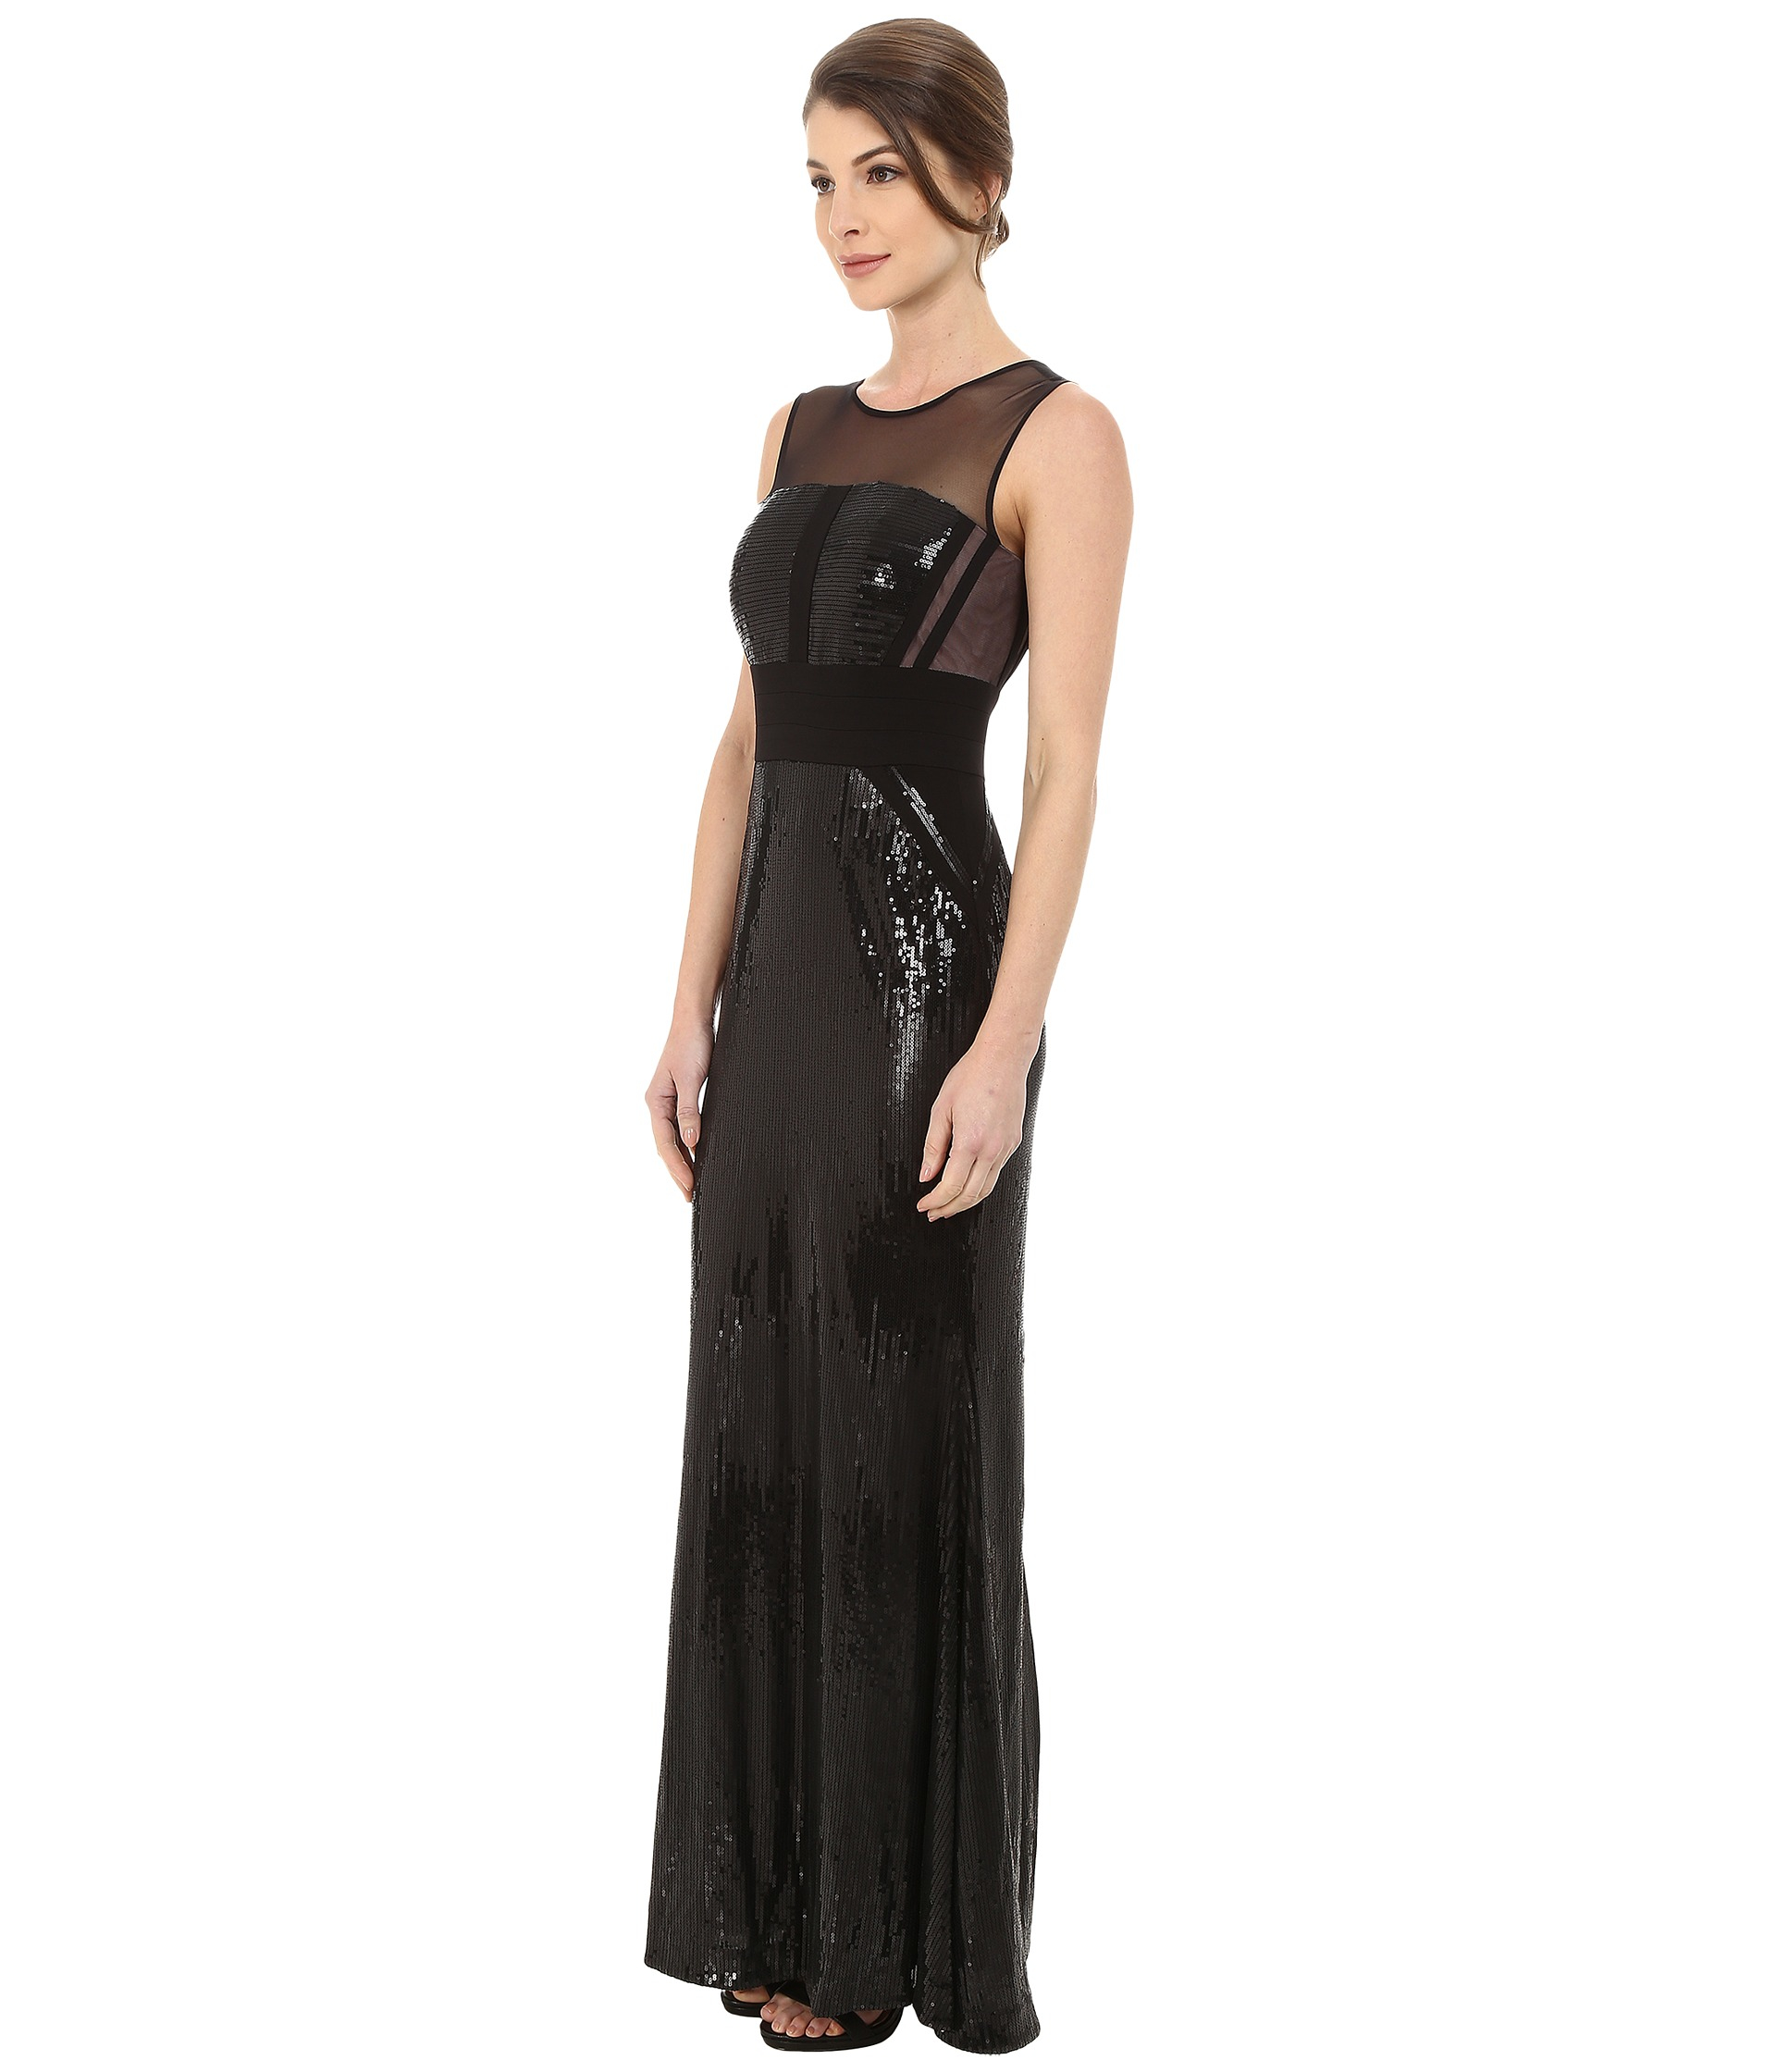 Lyst - Calvin Klein Sequin Gown At Illusion Yoke in Black